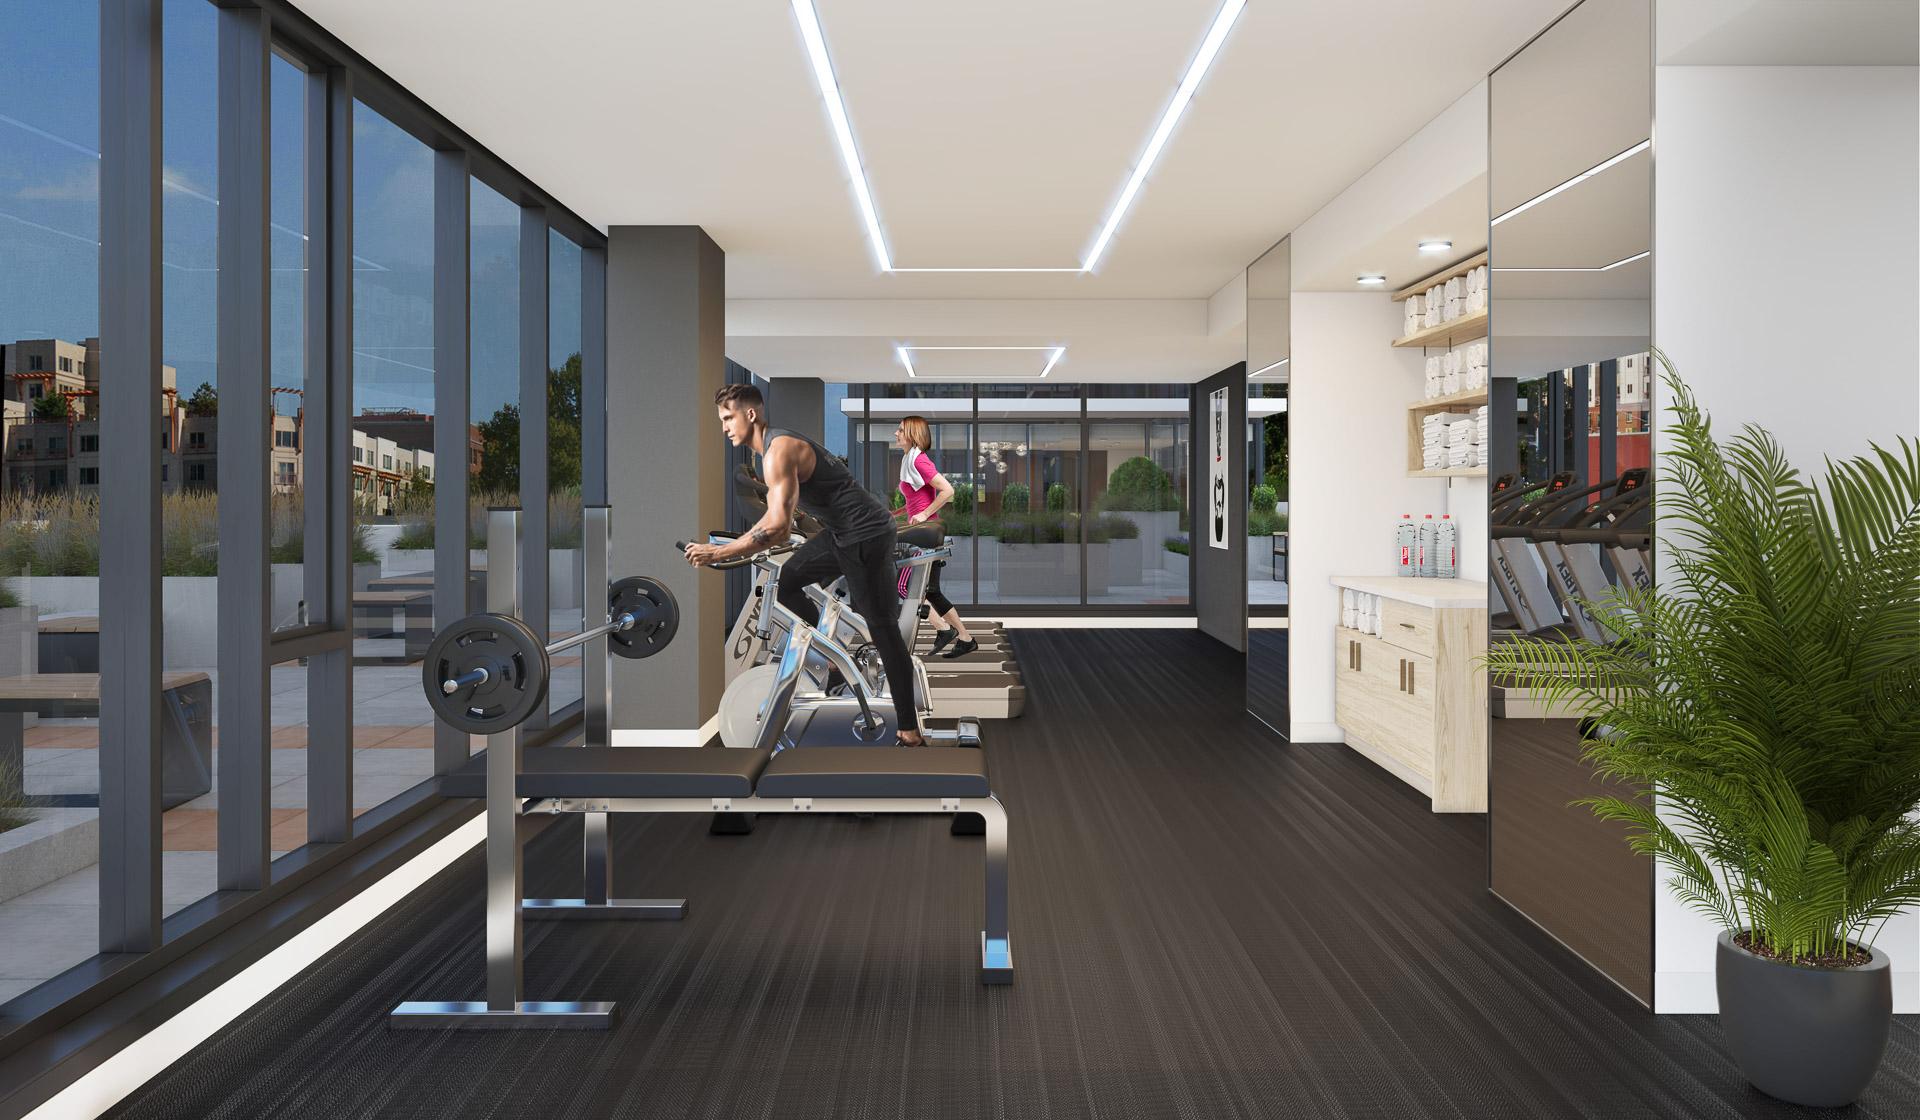 KODA_Interior7th_Fitness_Cam1_022819 b